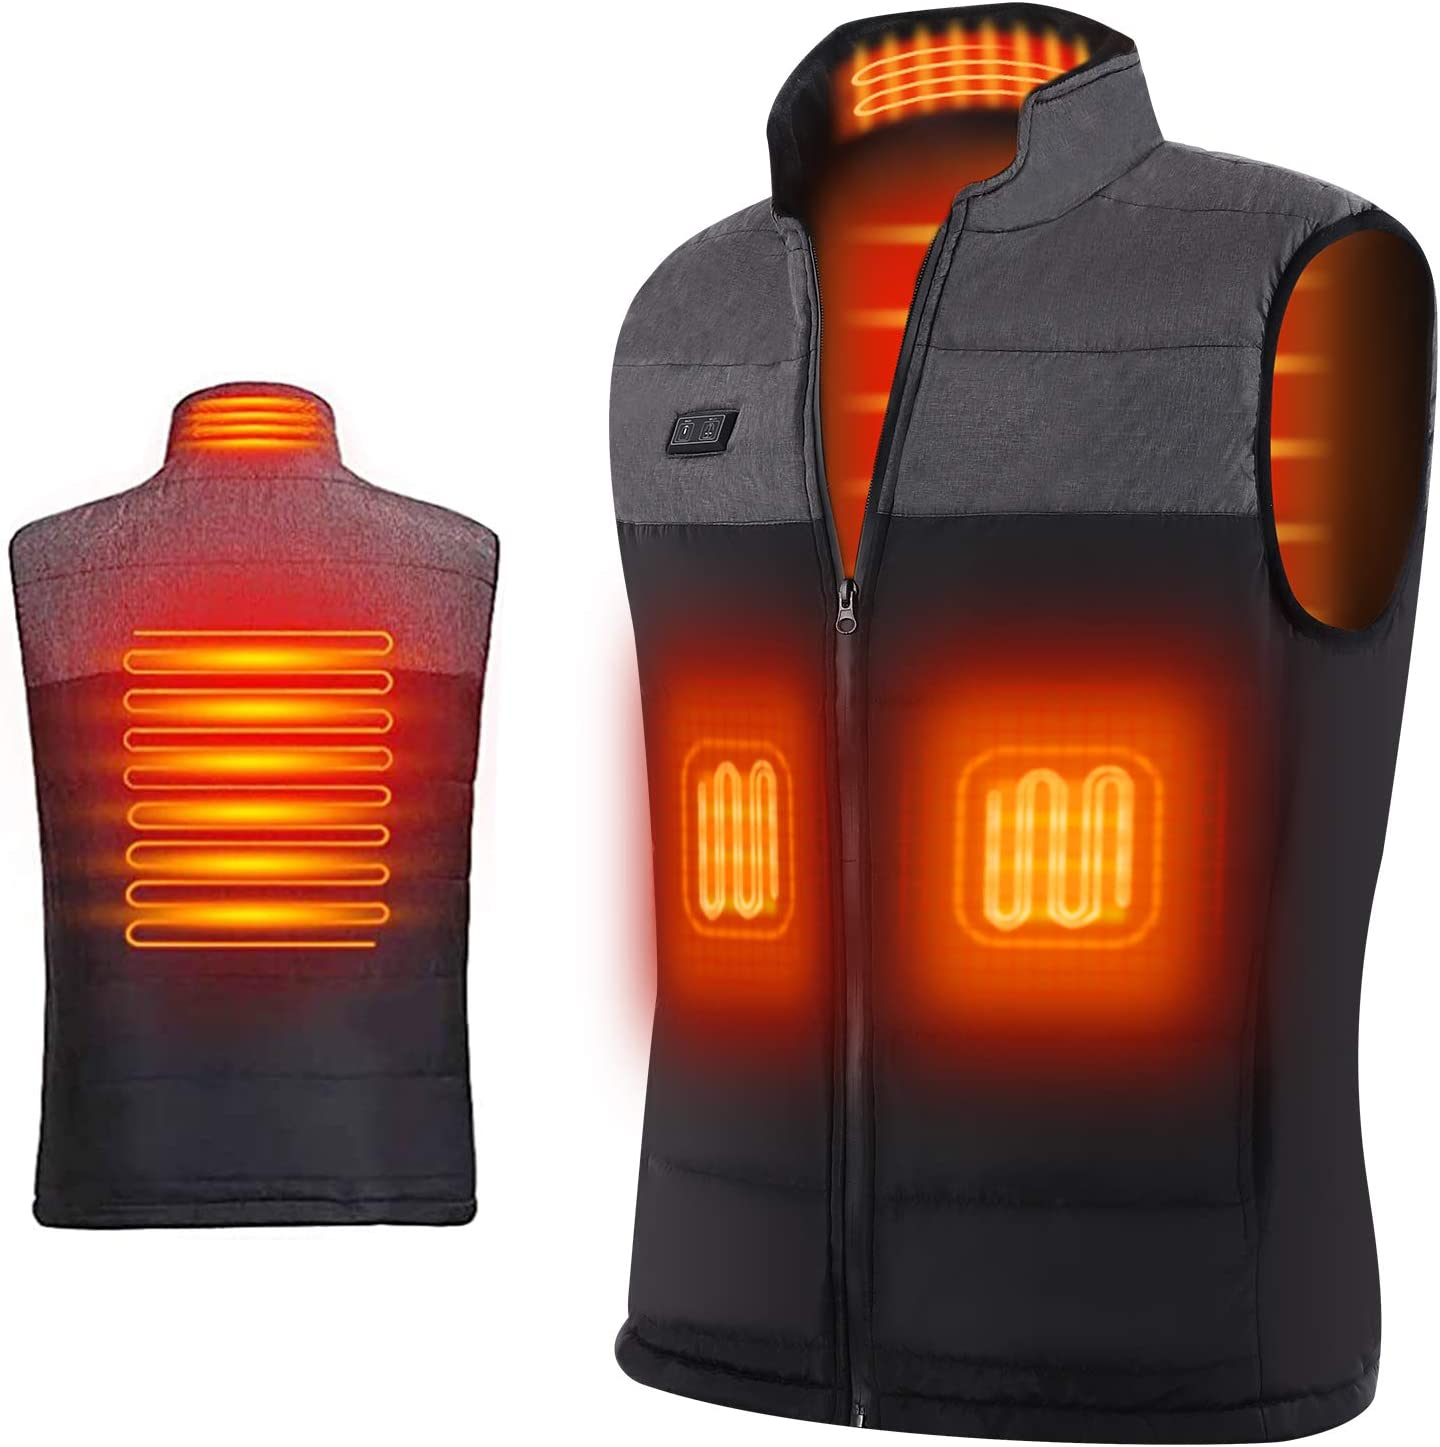 2019 Warm Padded Jacket Heated Vest for Men Smart Adjustable USB Charging Warm Men Heating Vest for Winter Outdoor Sports Skating Skiing Large Size Black-M